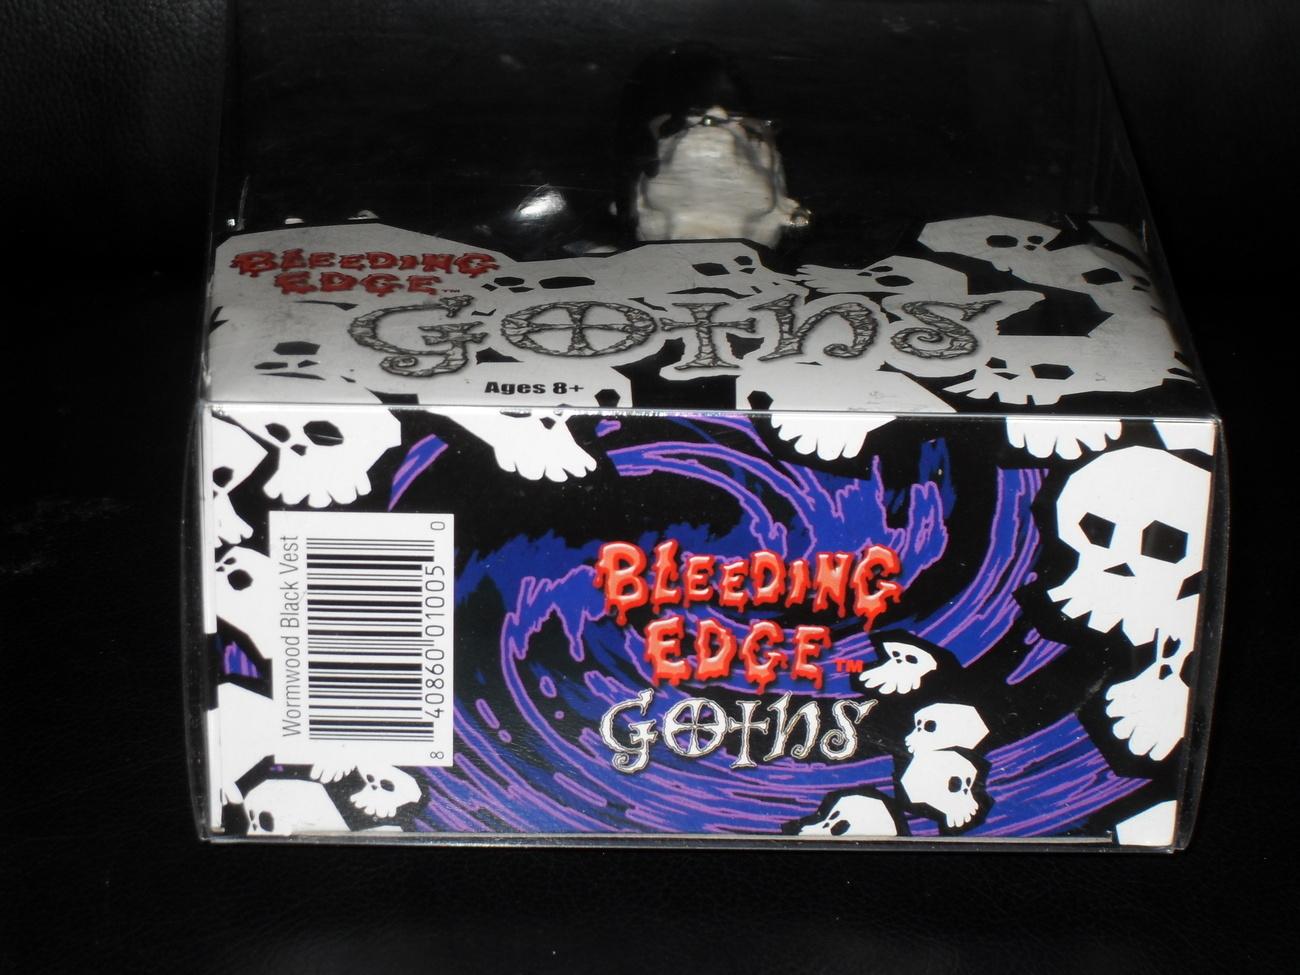 Goths Bleeding Edge Wormwood In The Package